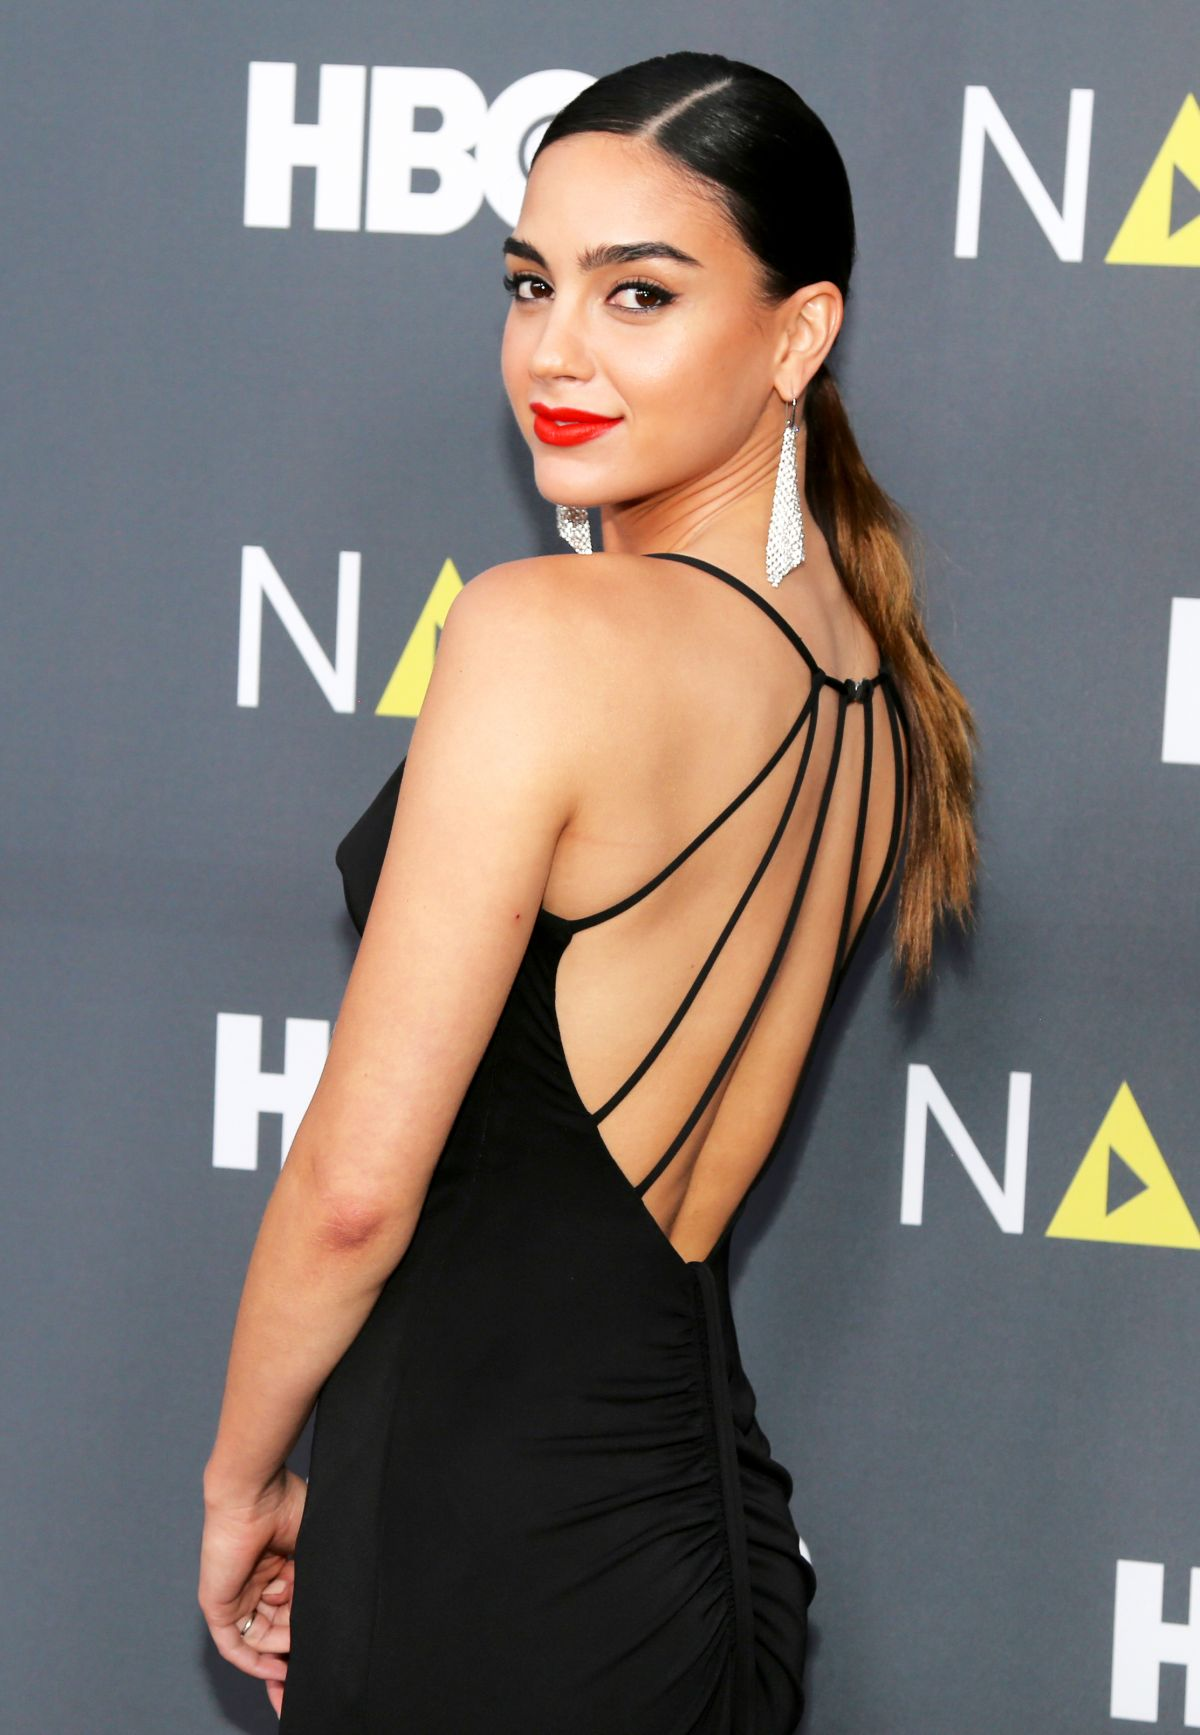 Melissa barrera 2019 naked (21 photos), Tits Celebrity pic